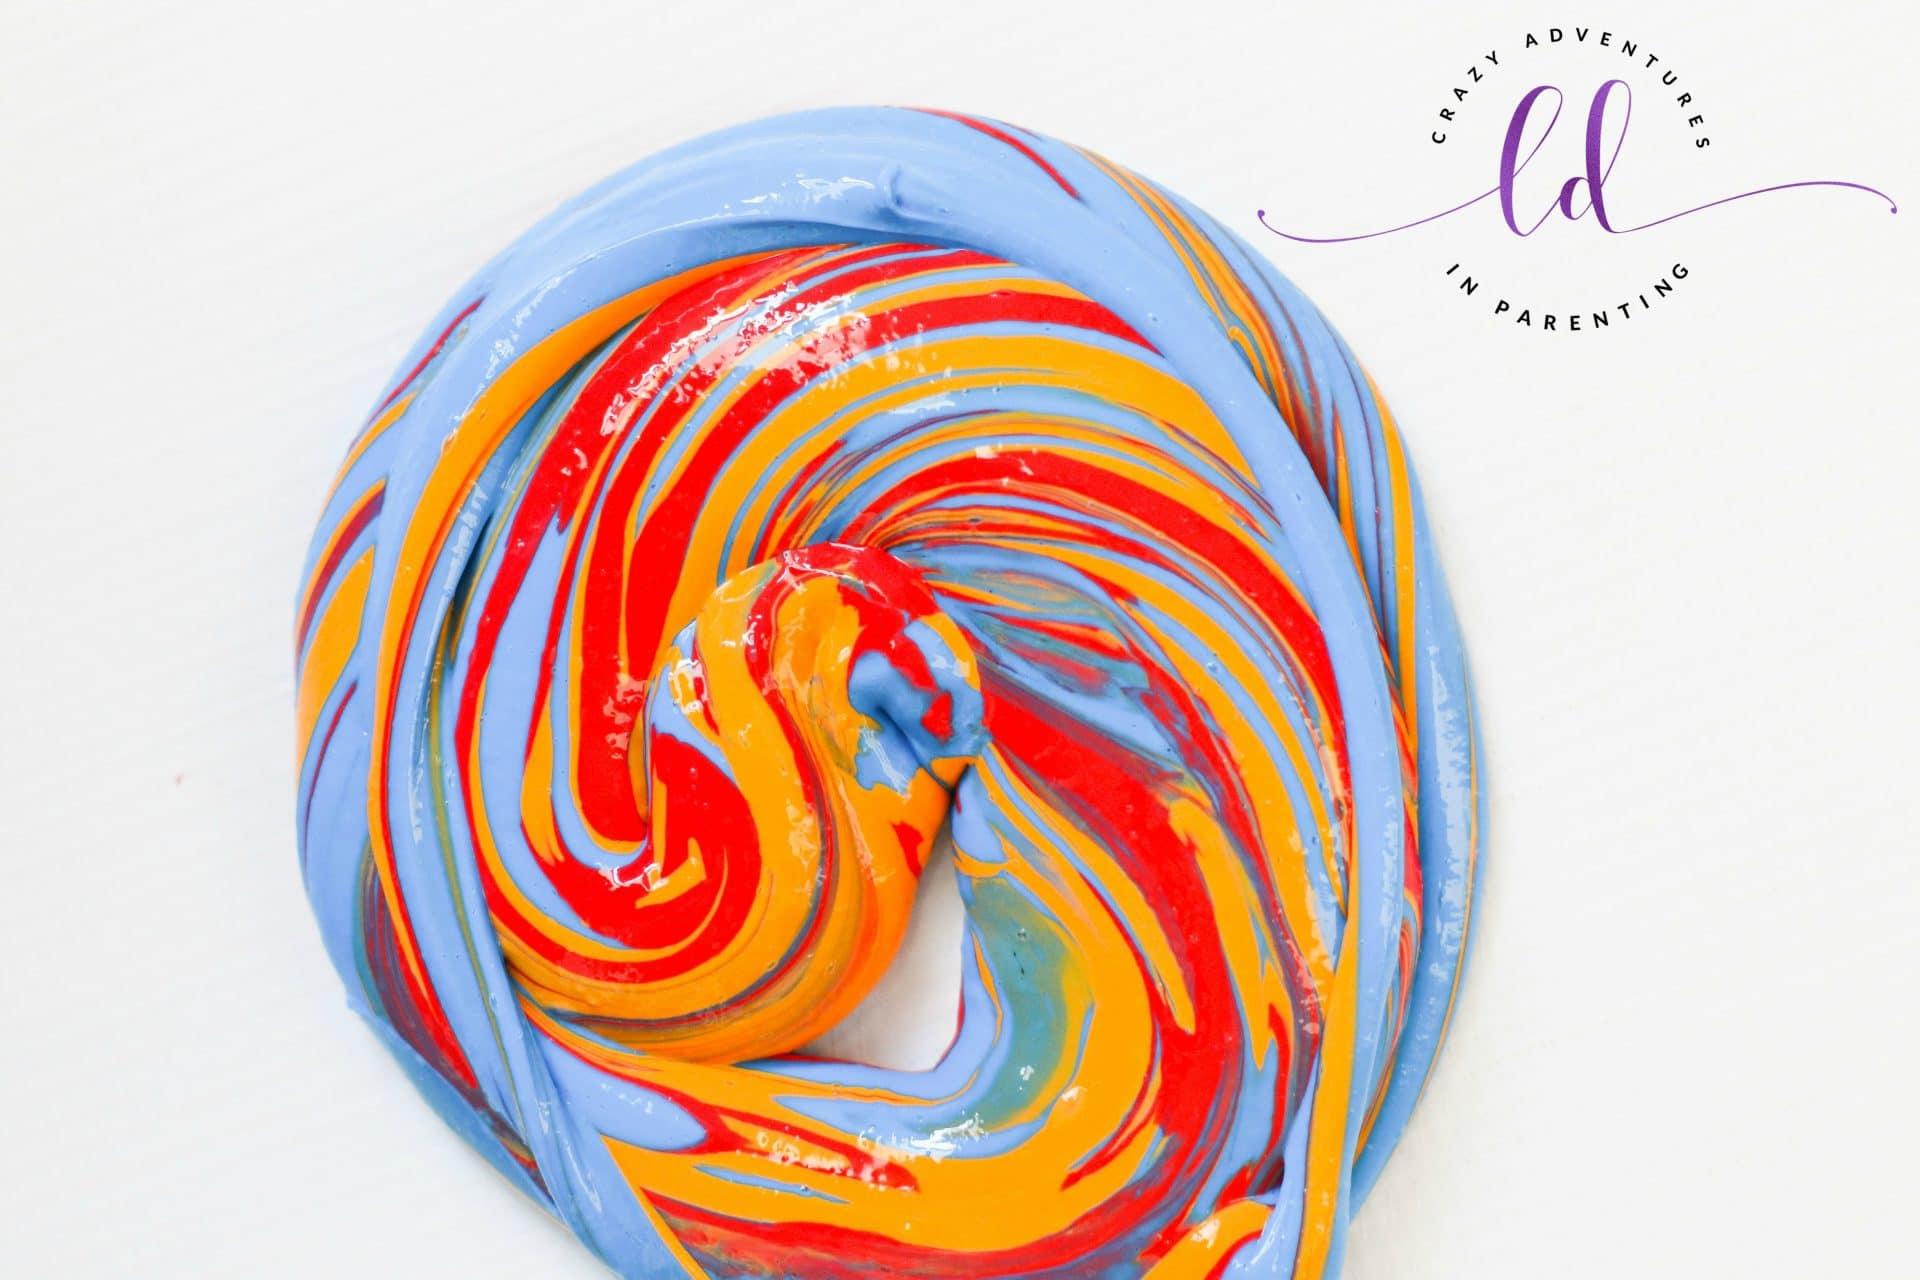 Swirled rainbow slime